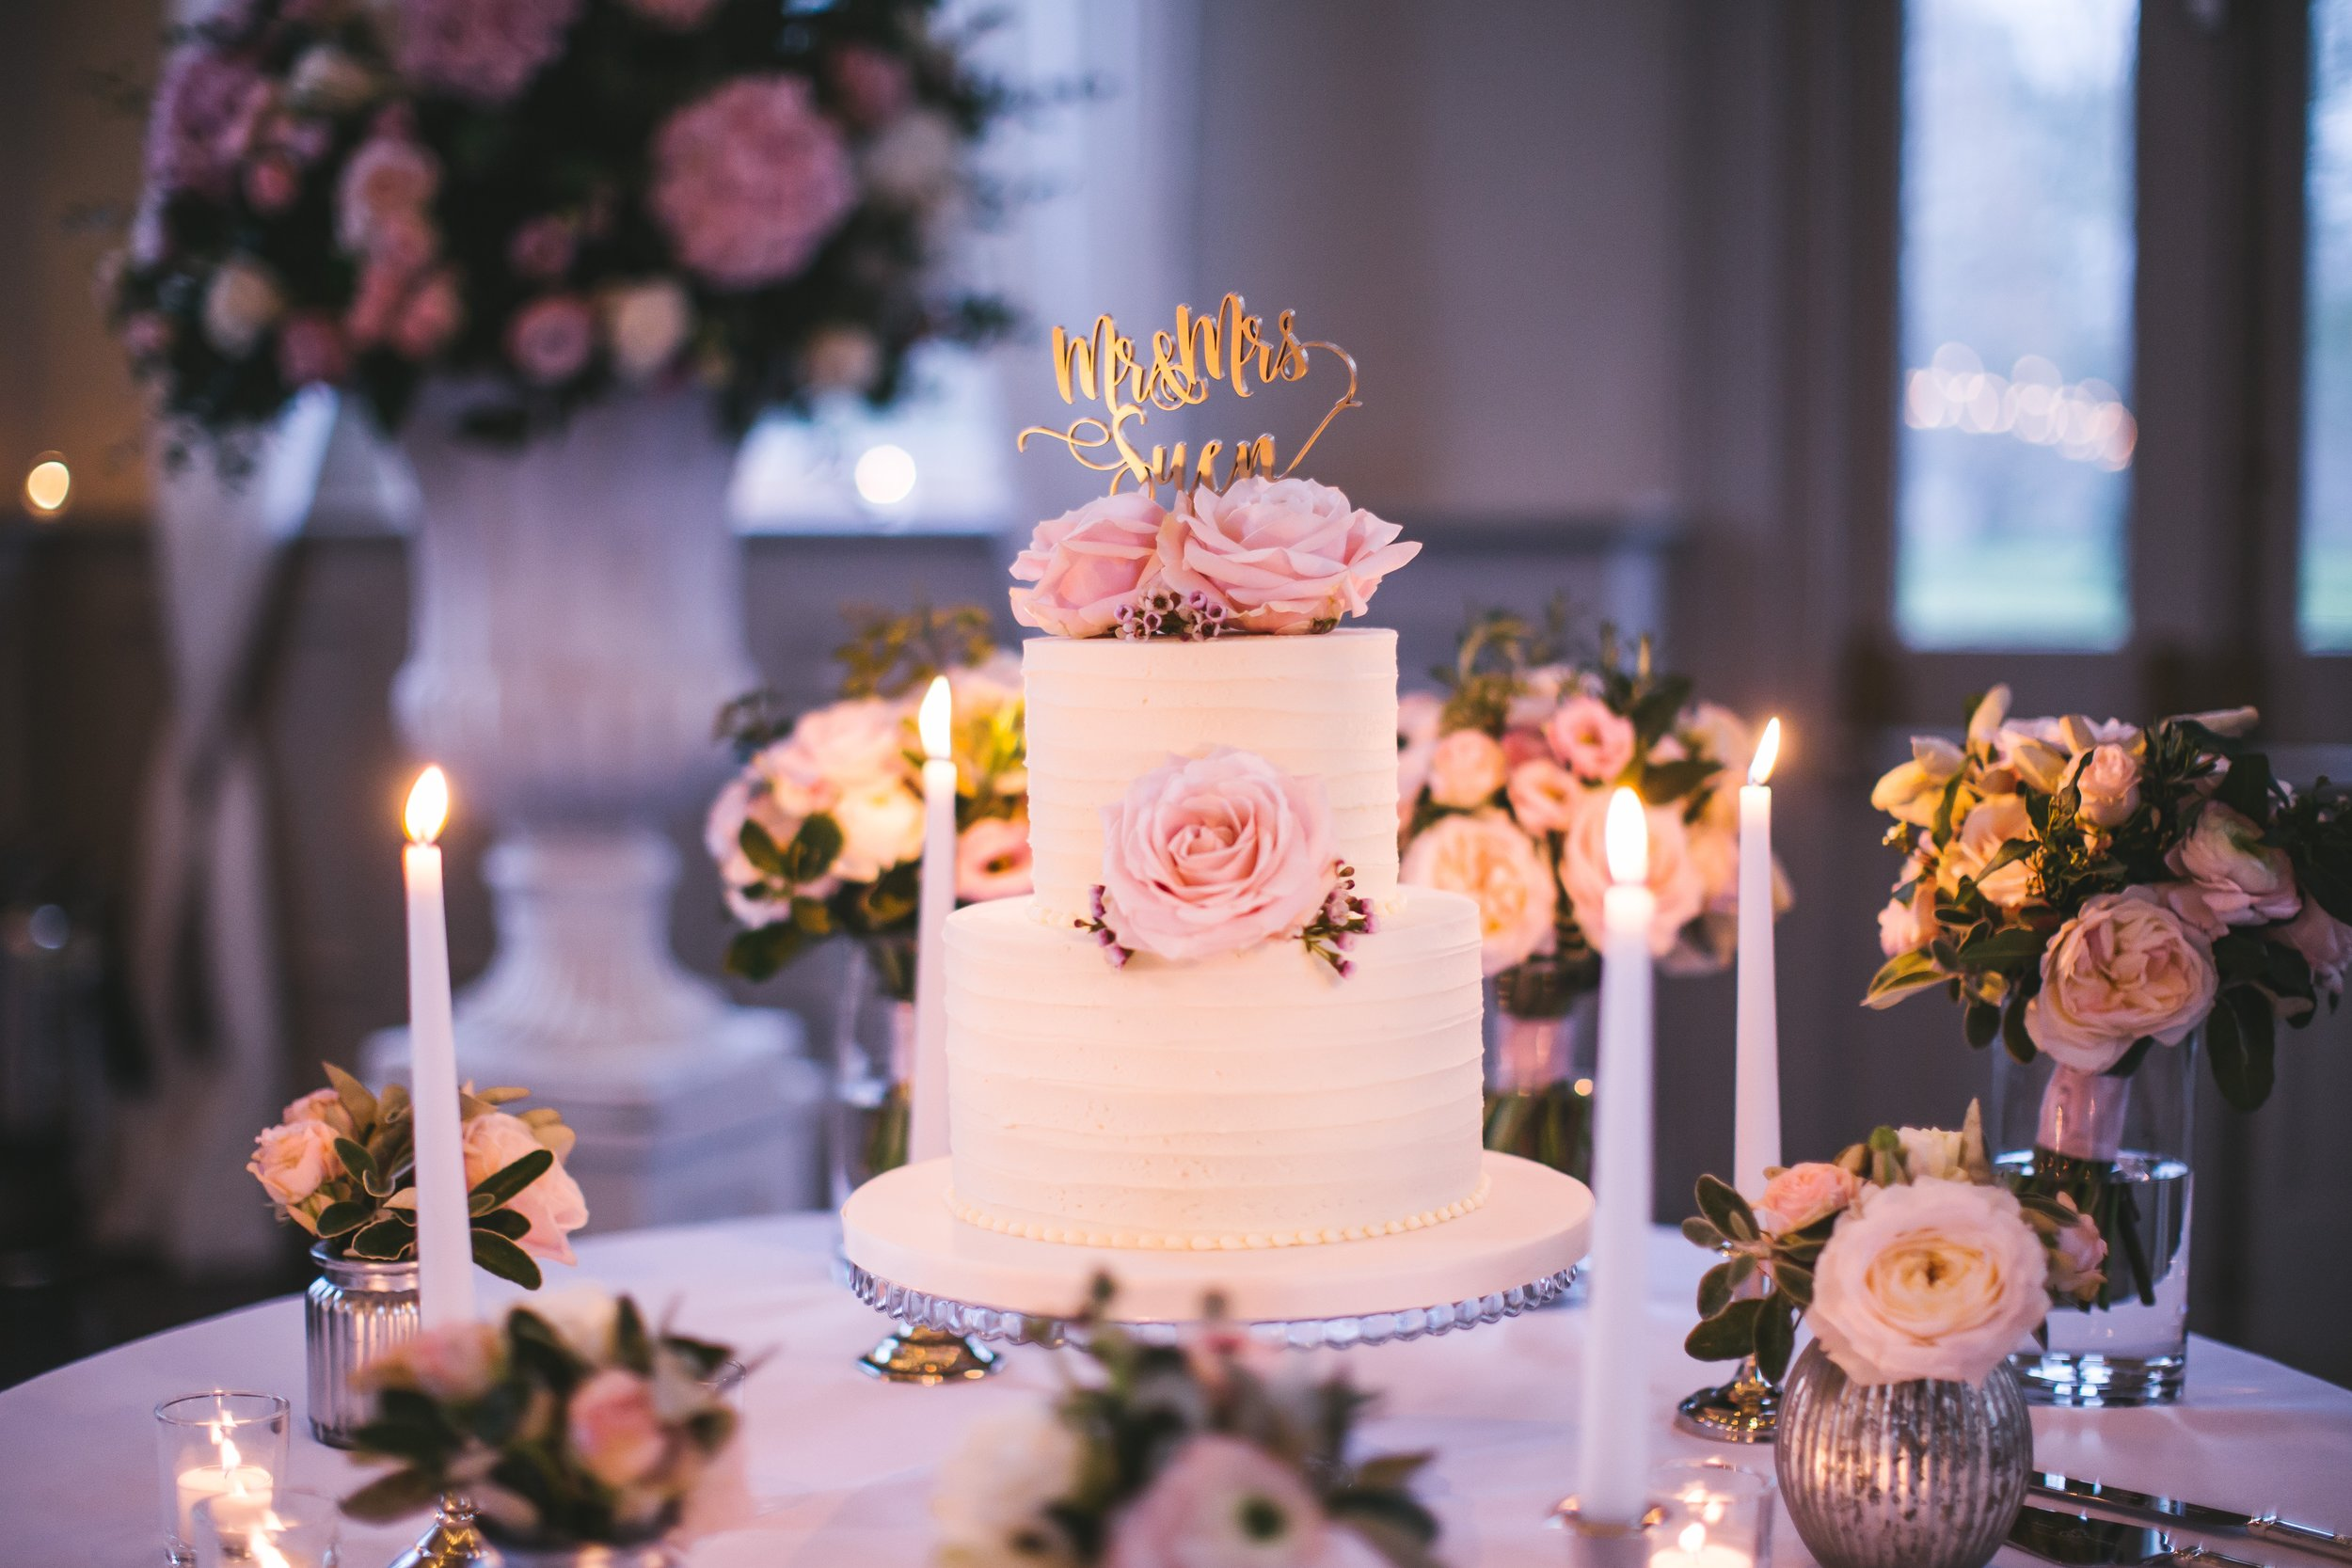 flower-pink-wedding-cake-ceremony-icing-1412944-pxhere.com.jpg